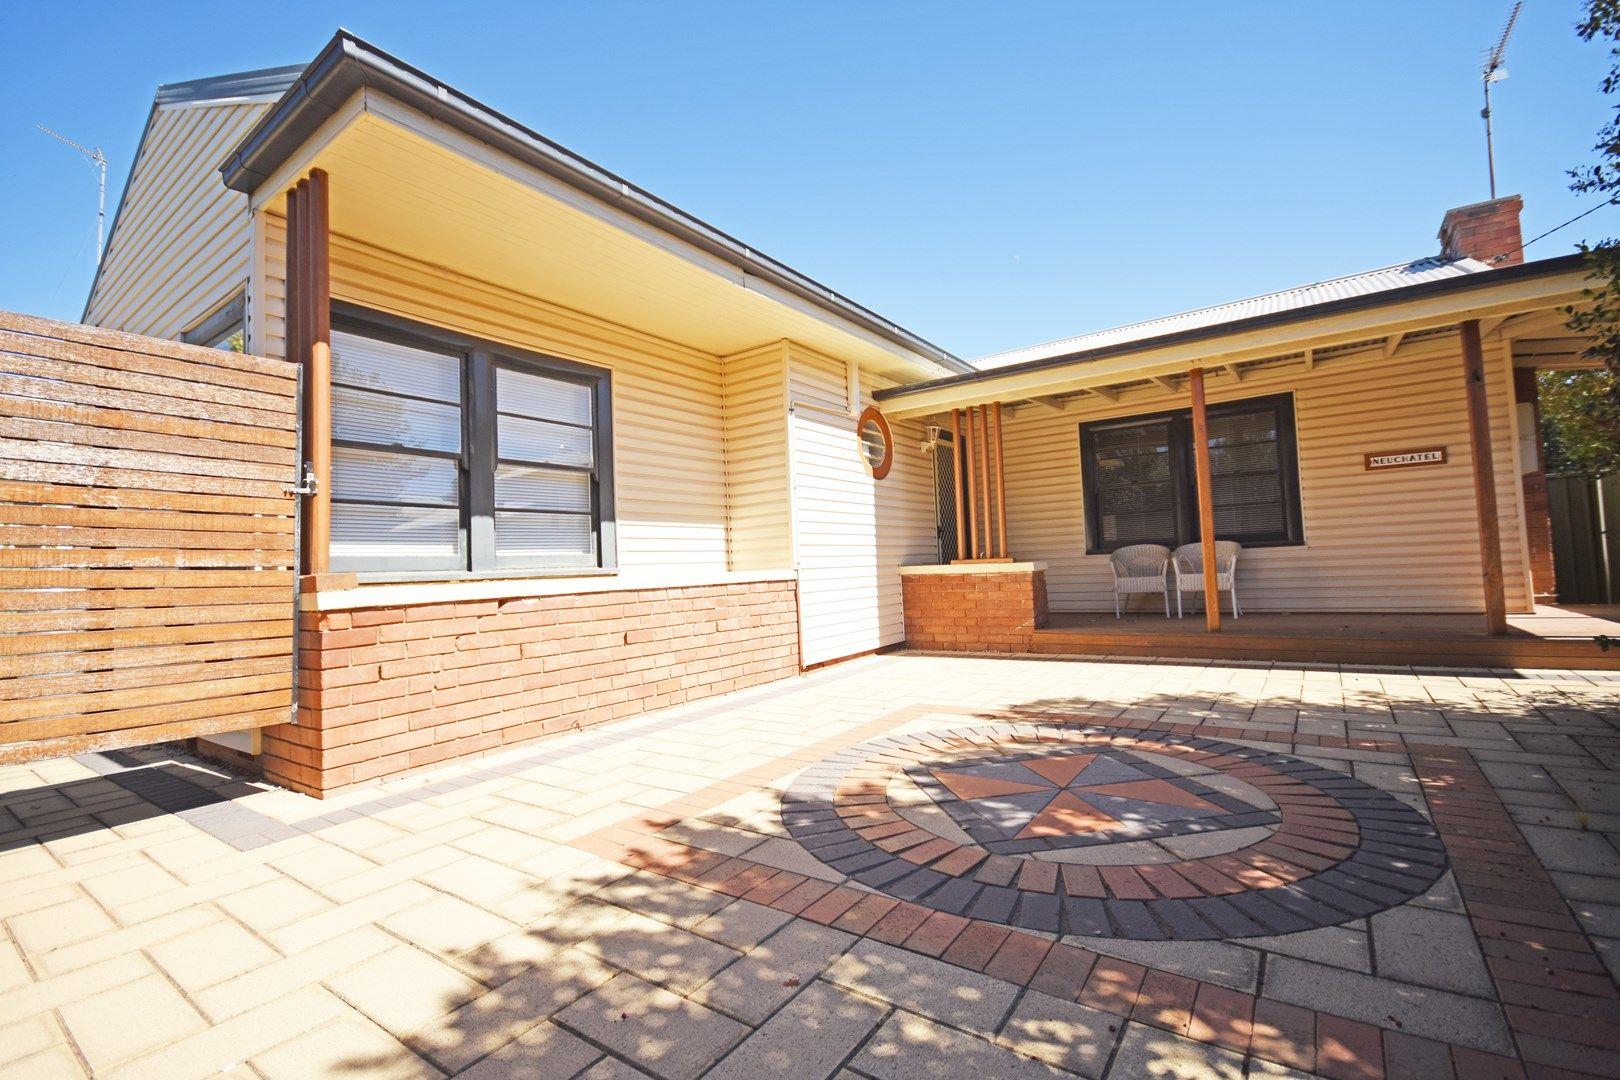 337 Macquarie St, Dubbo NSW 2830, Image 0